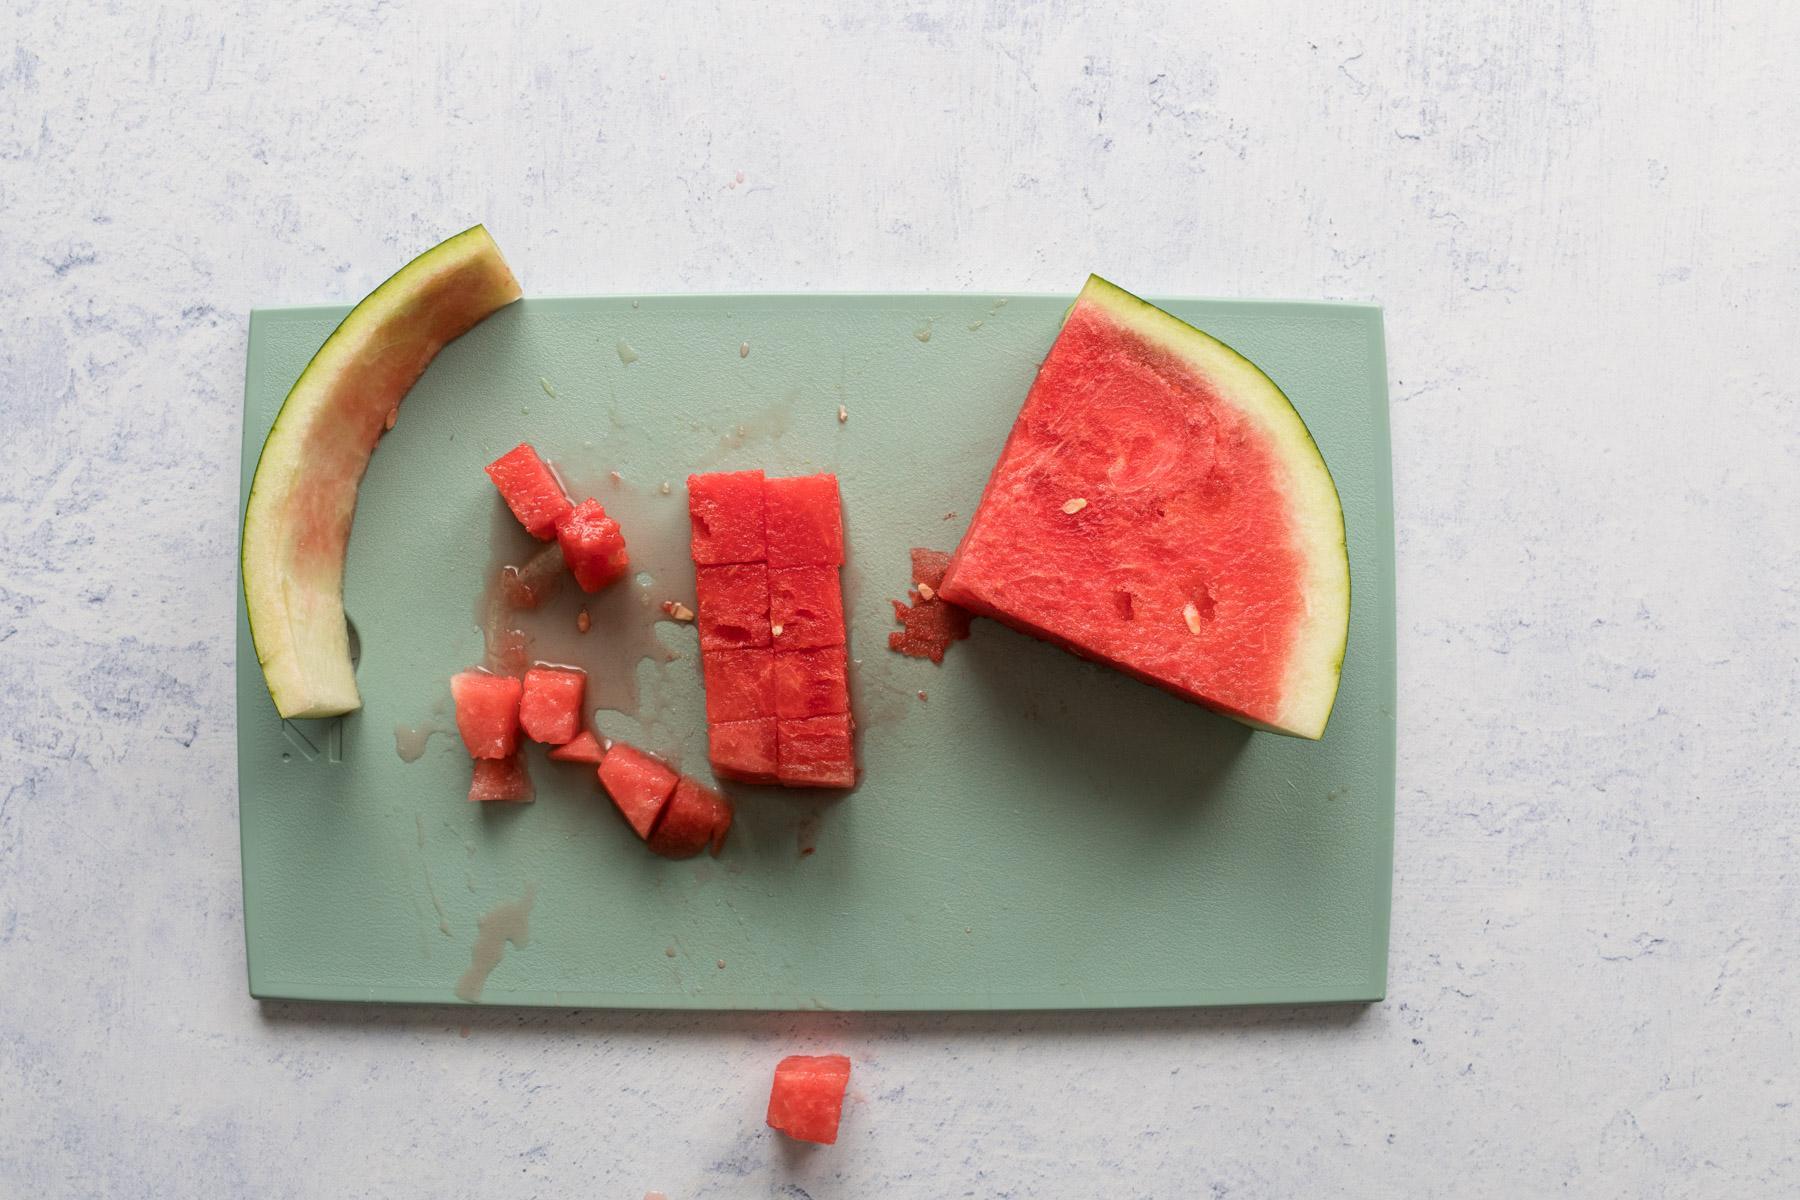 cut watermelon on a green cutting board